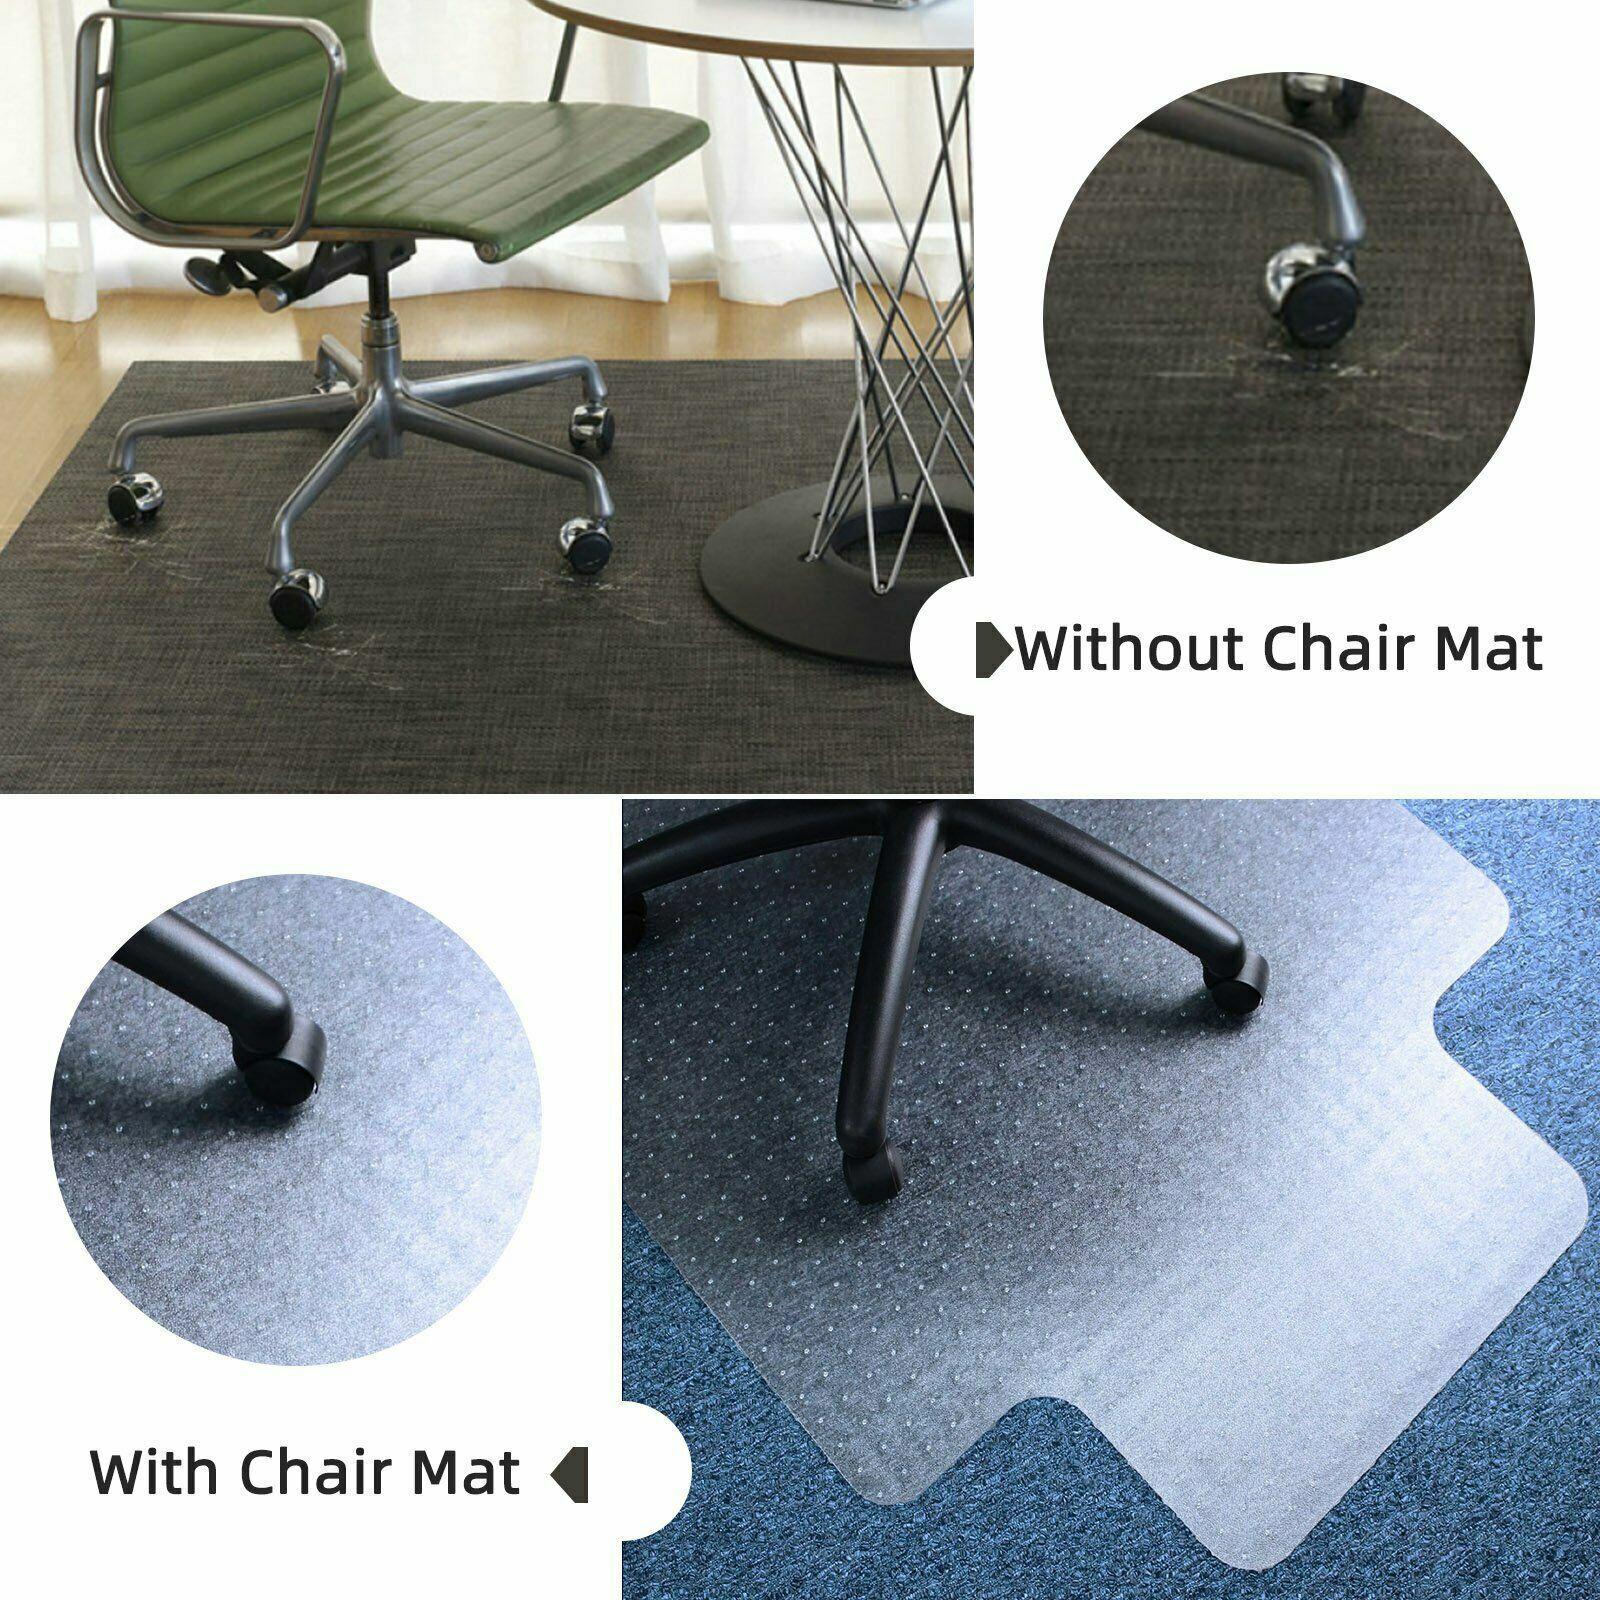 Mat PVC Home Office Carpet Hard Protector Desk Floor Chair Tranparent With Nail Door Mats & Floor Mats